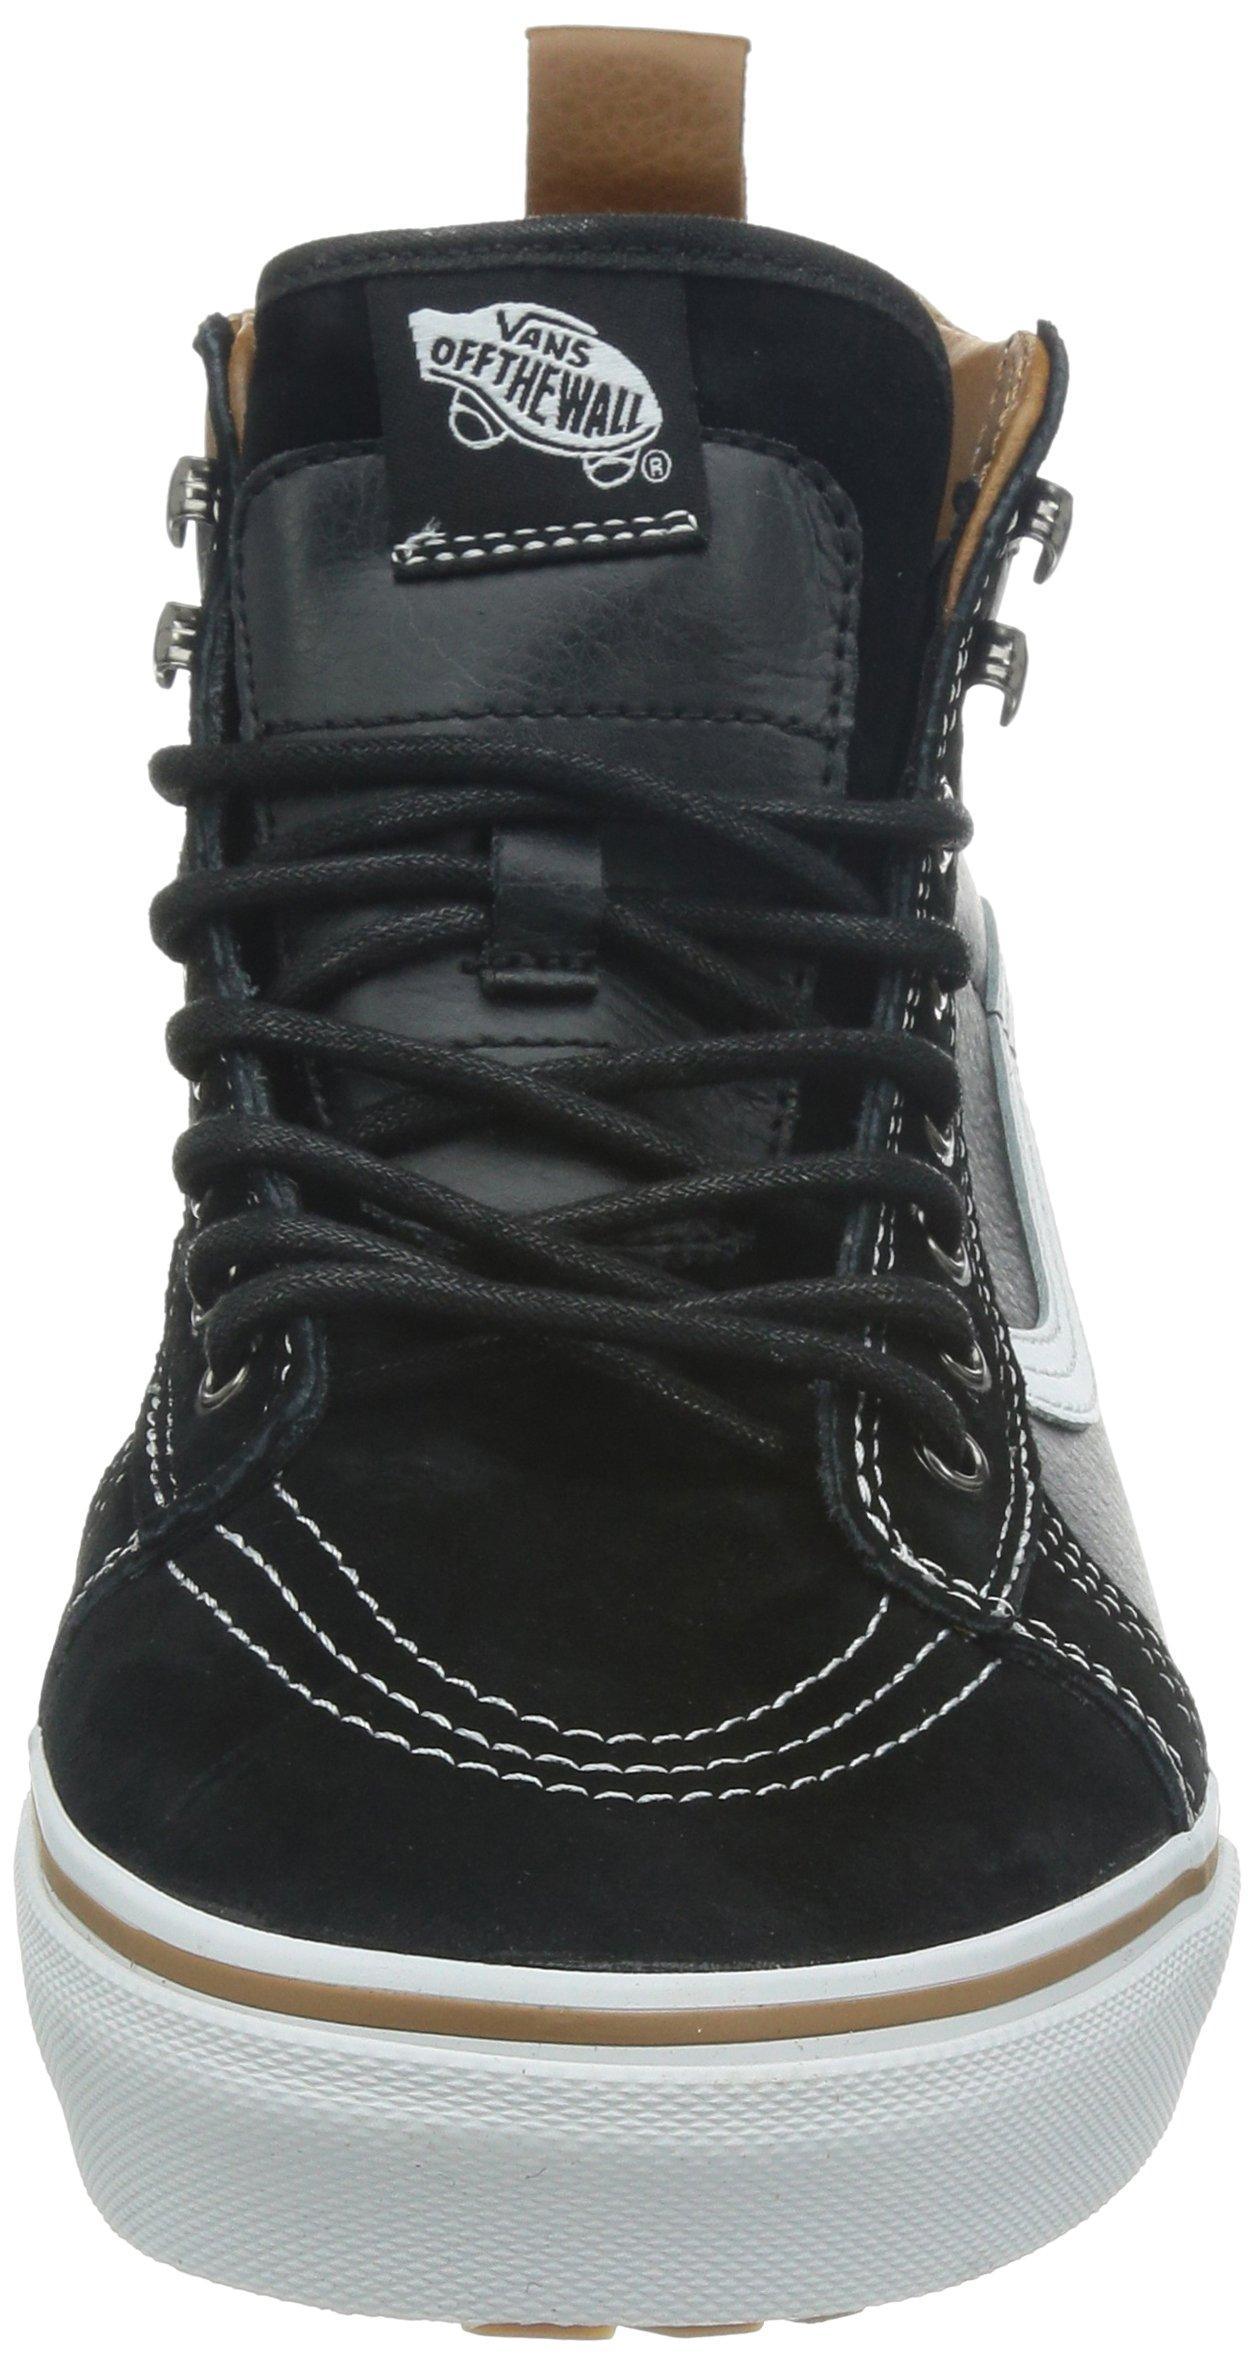 Vans Unisex Sk8-Hi MTE (MTE) Black/True White Skate Shoe 8.5 Men US/10 Women US by Vans (Image #4)